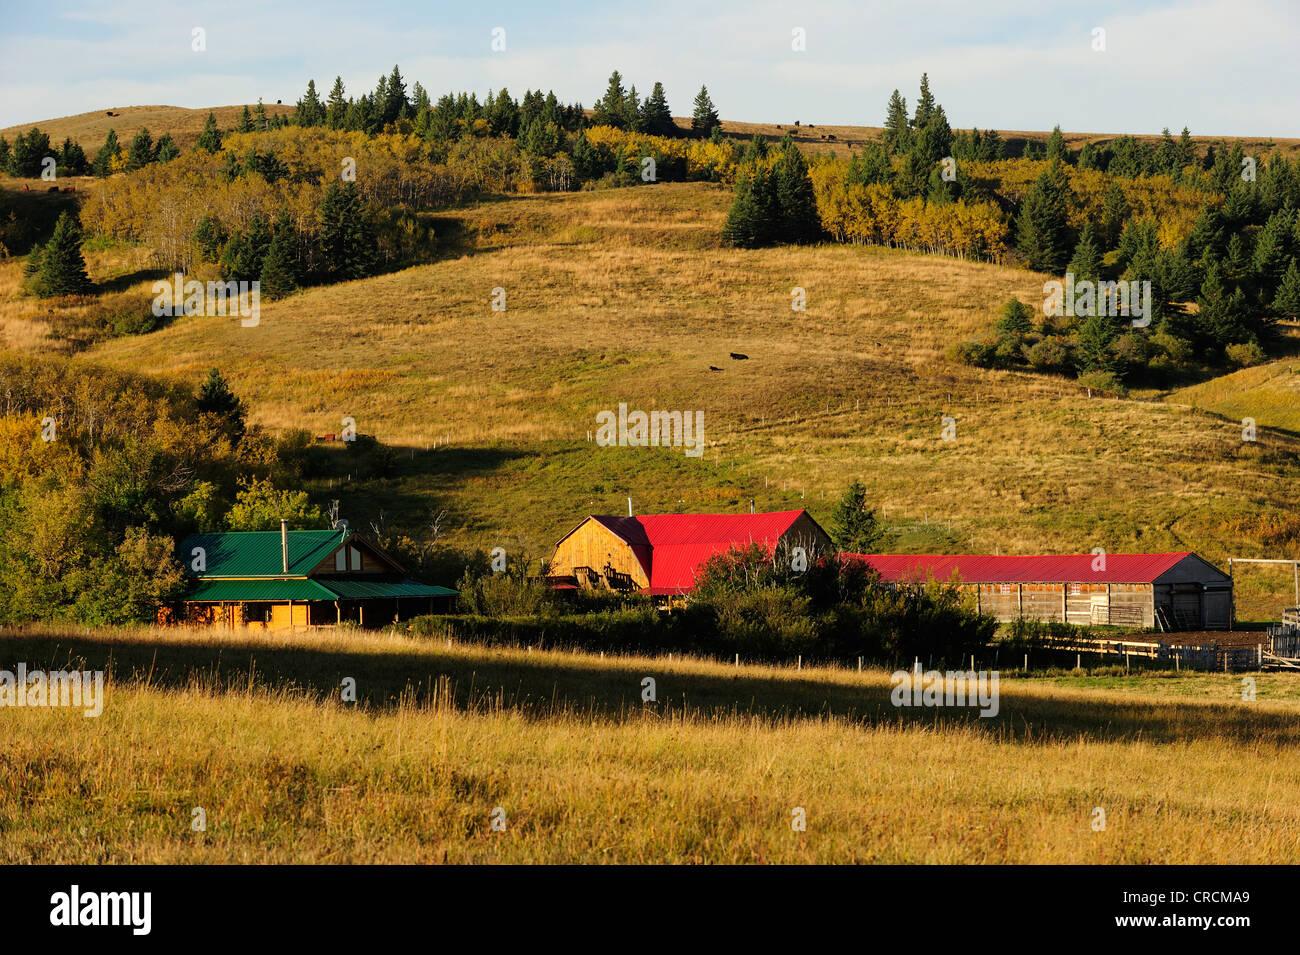 Cowboy ranch on the prairie, Saskatchewan, Canada - Stock Image